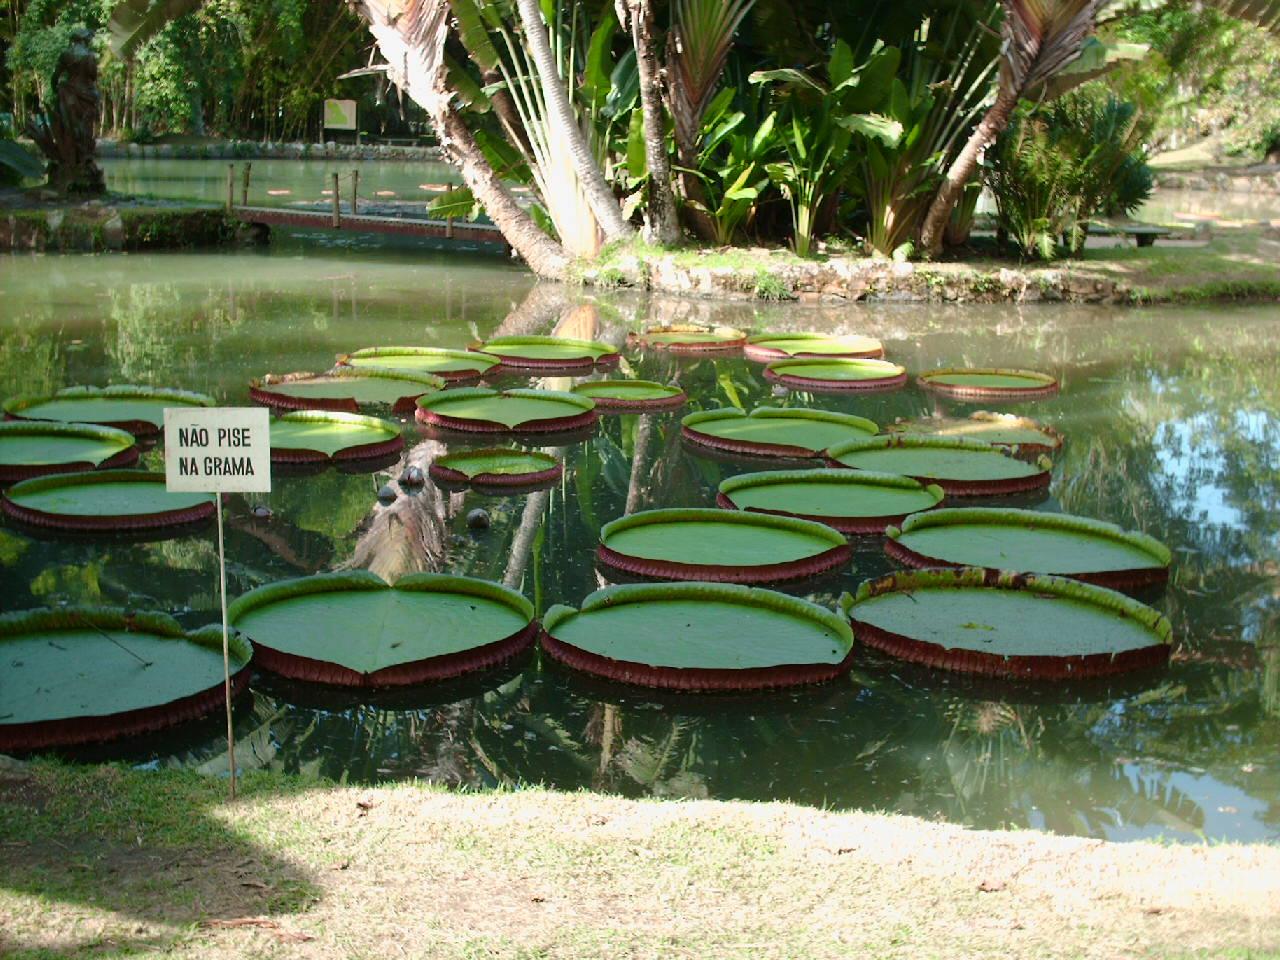 artesanato jardim botanico:Mari Atelier: Jardim Botânico e Vista Chinesa-RJ